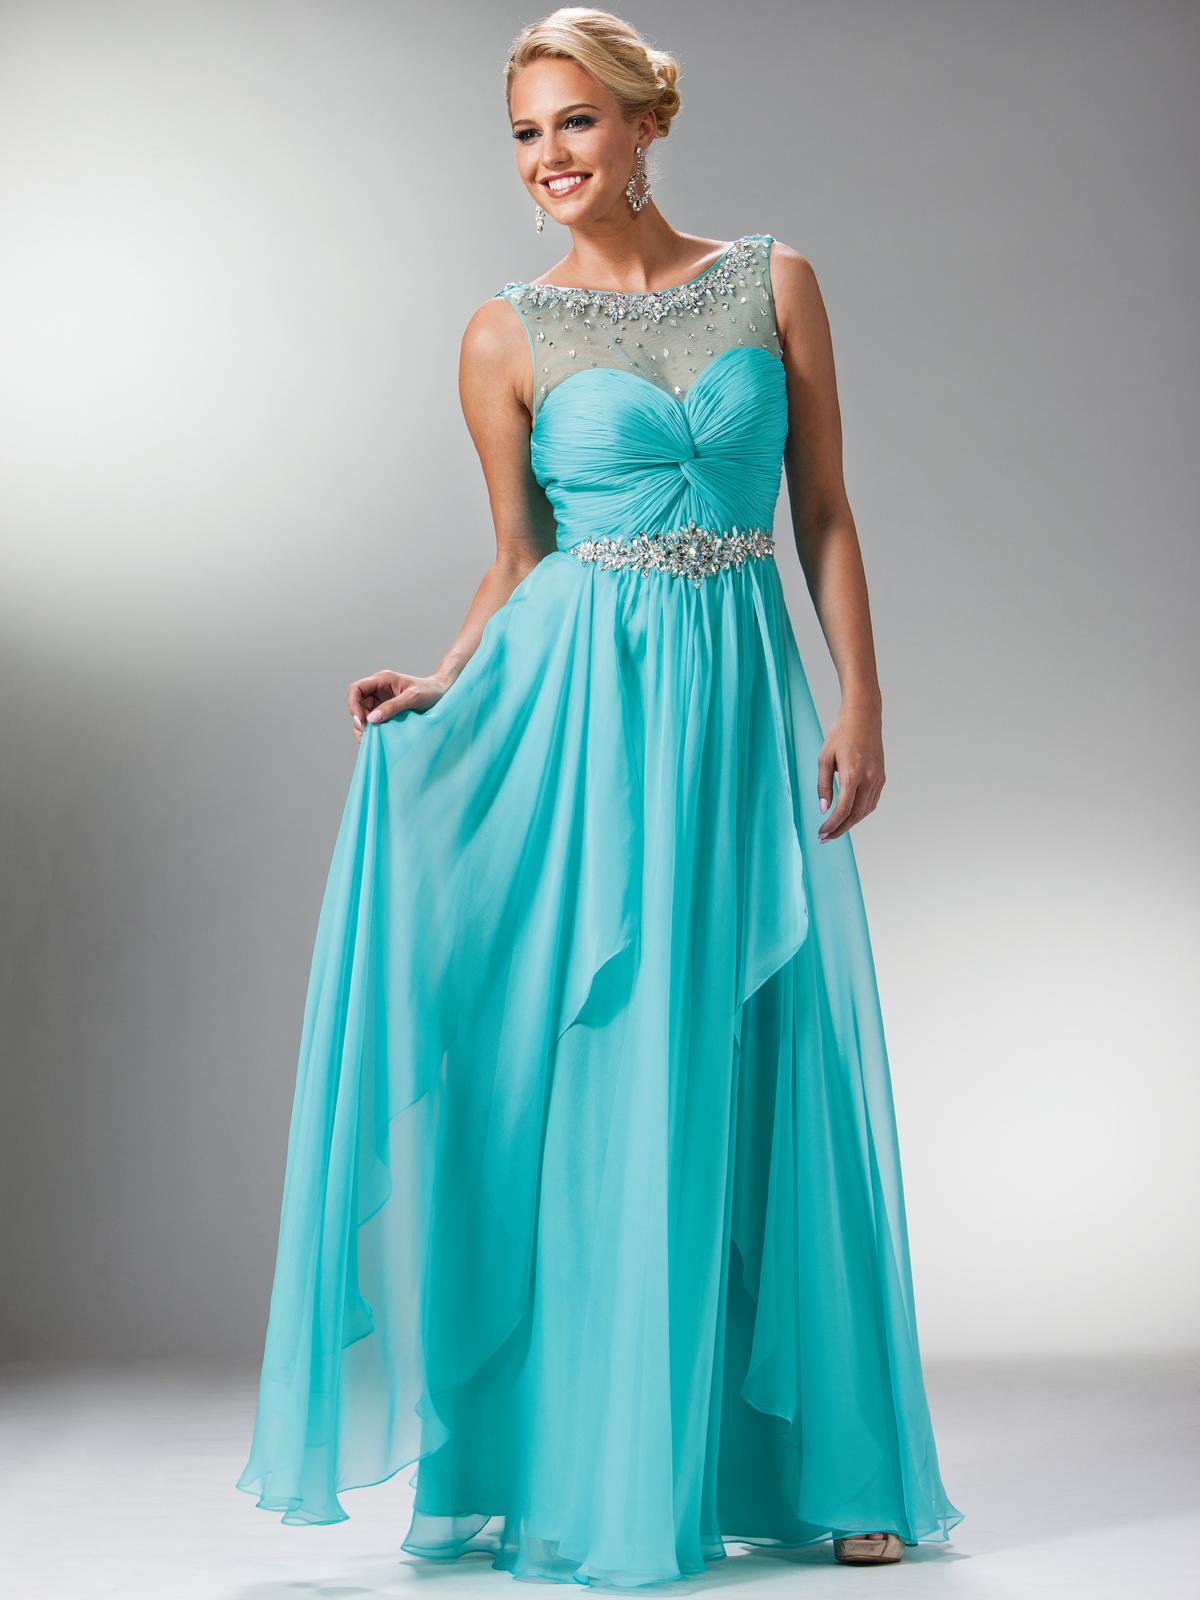 Top Prom Dresses